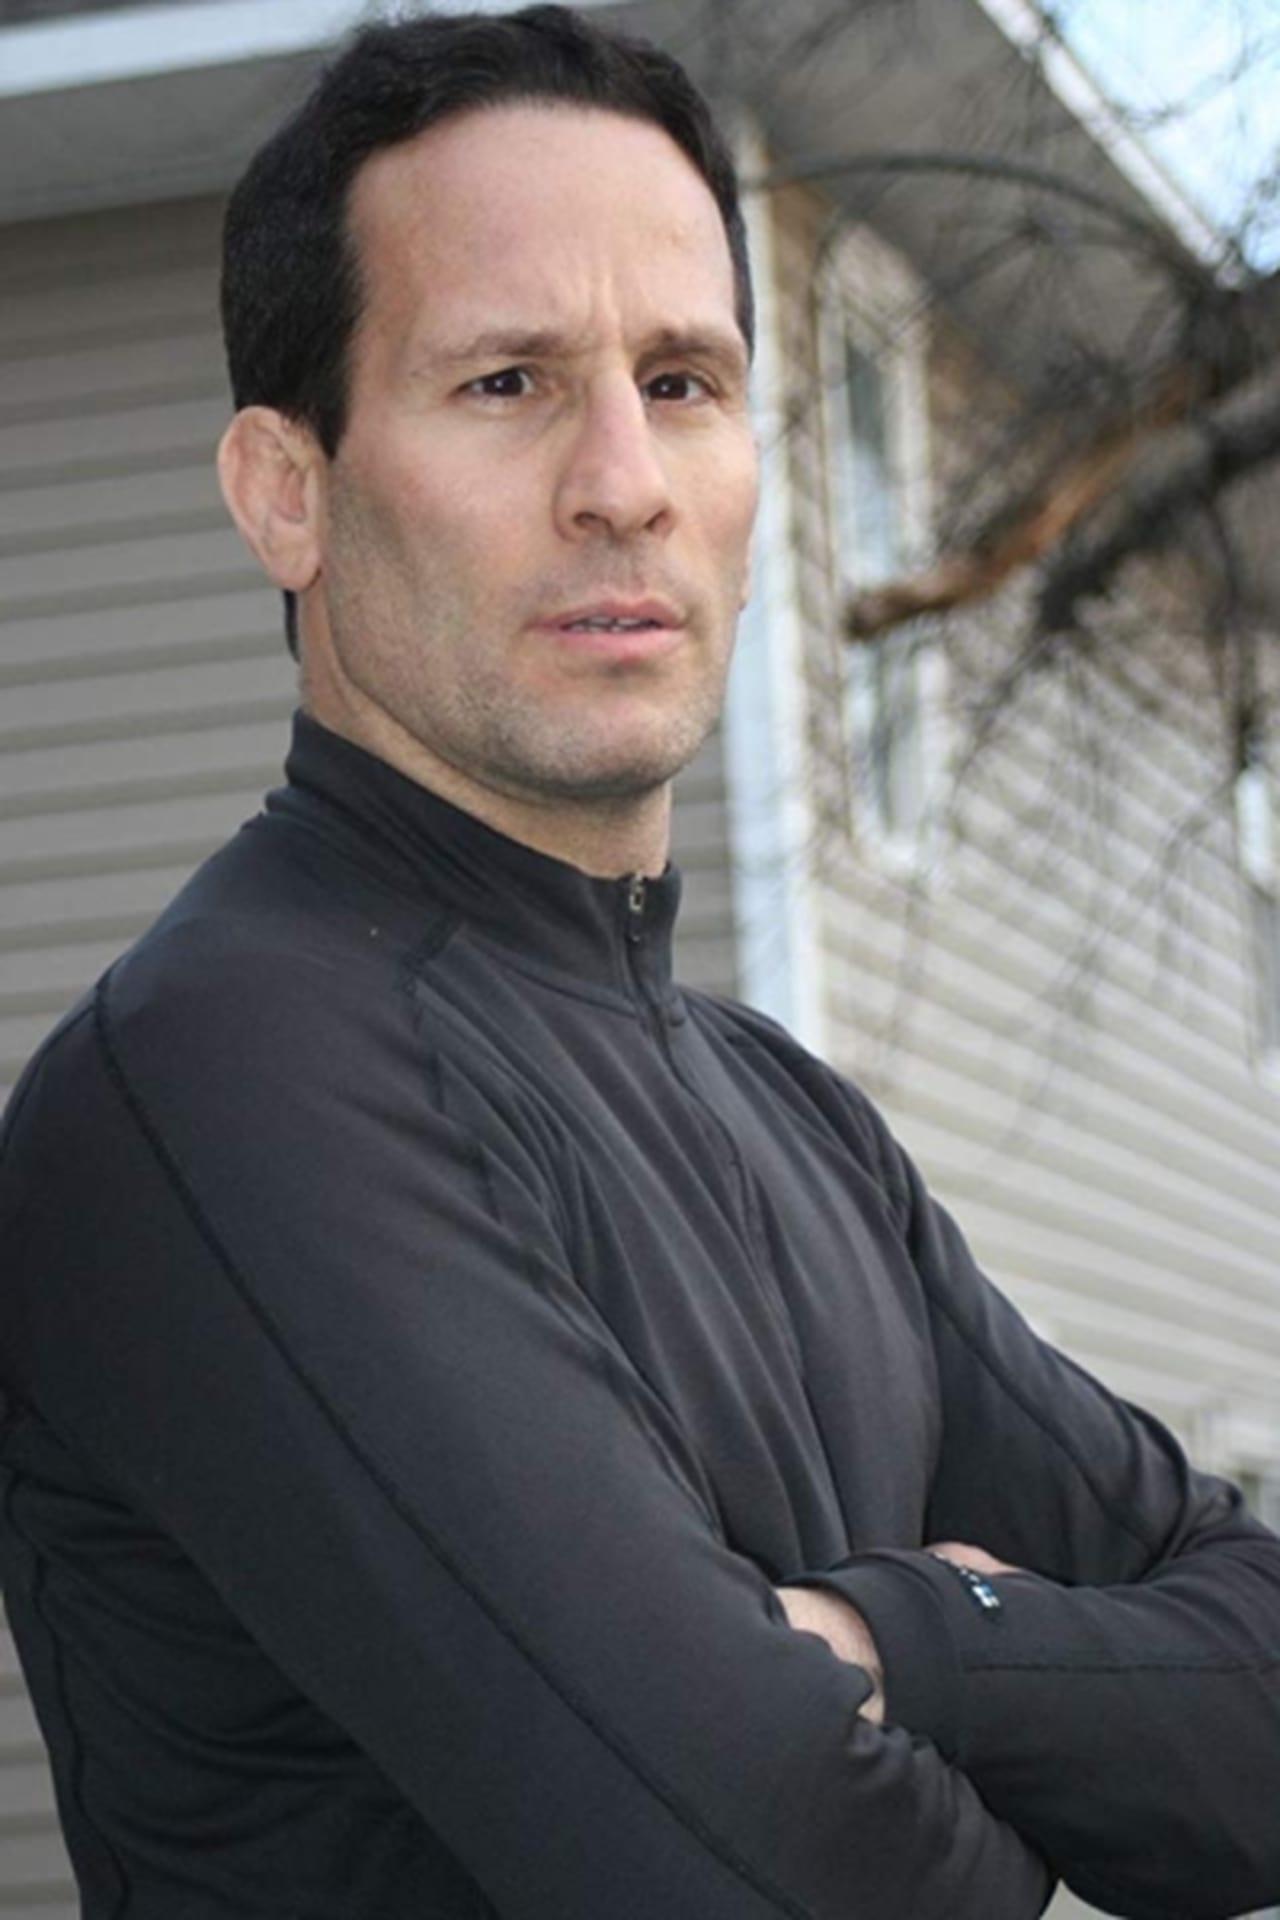 Jay Carrado